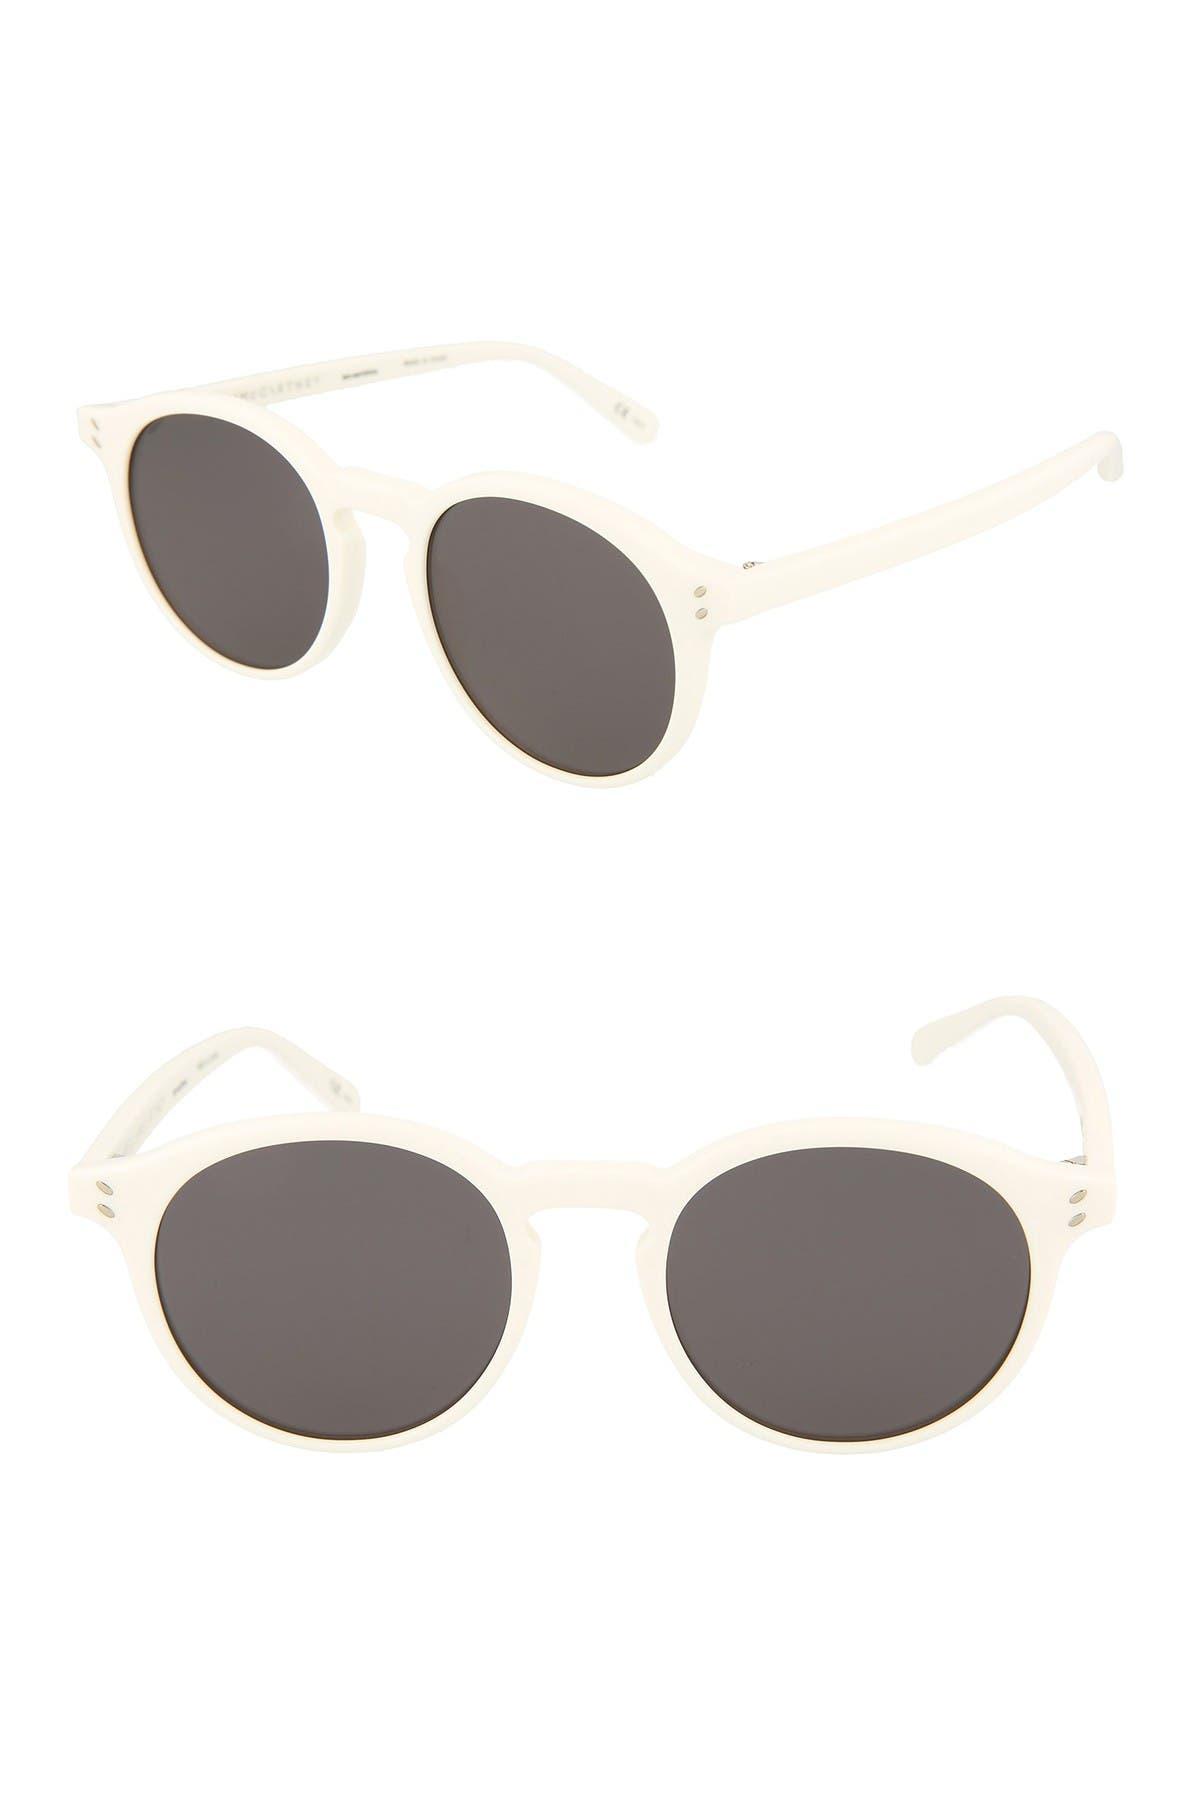 Retro Sunglasses | Vintage Glasses | New Vintage Eyeglasses Stella McCartney 53mm RoundOval Sunglasses Size One Size - White White Smoke at Nordstrom Rack $69.97 AT vintagedancer.com